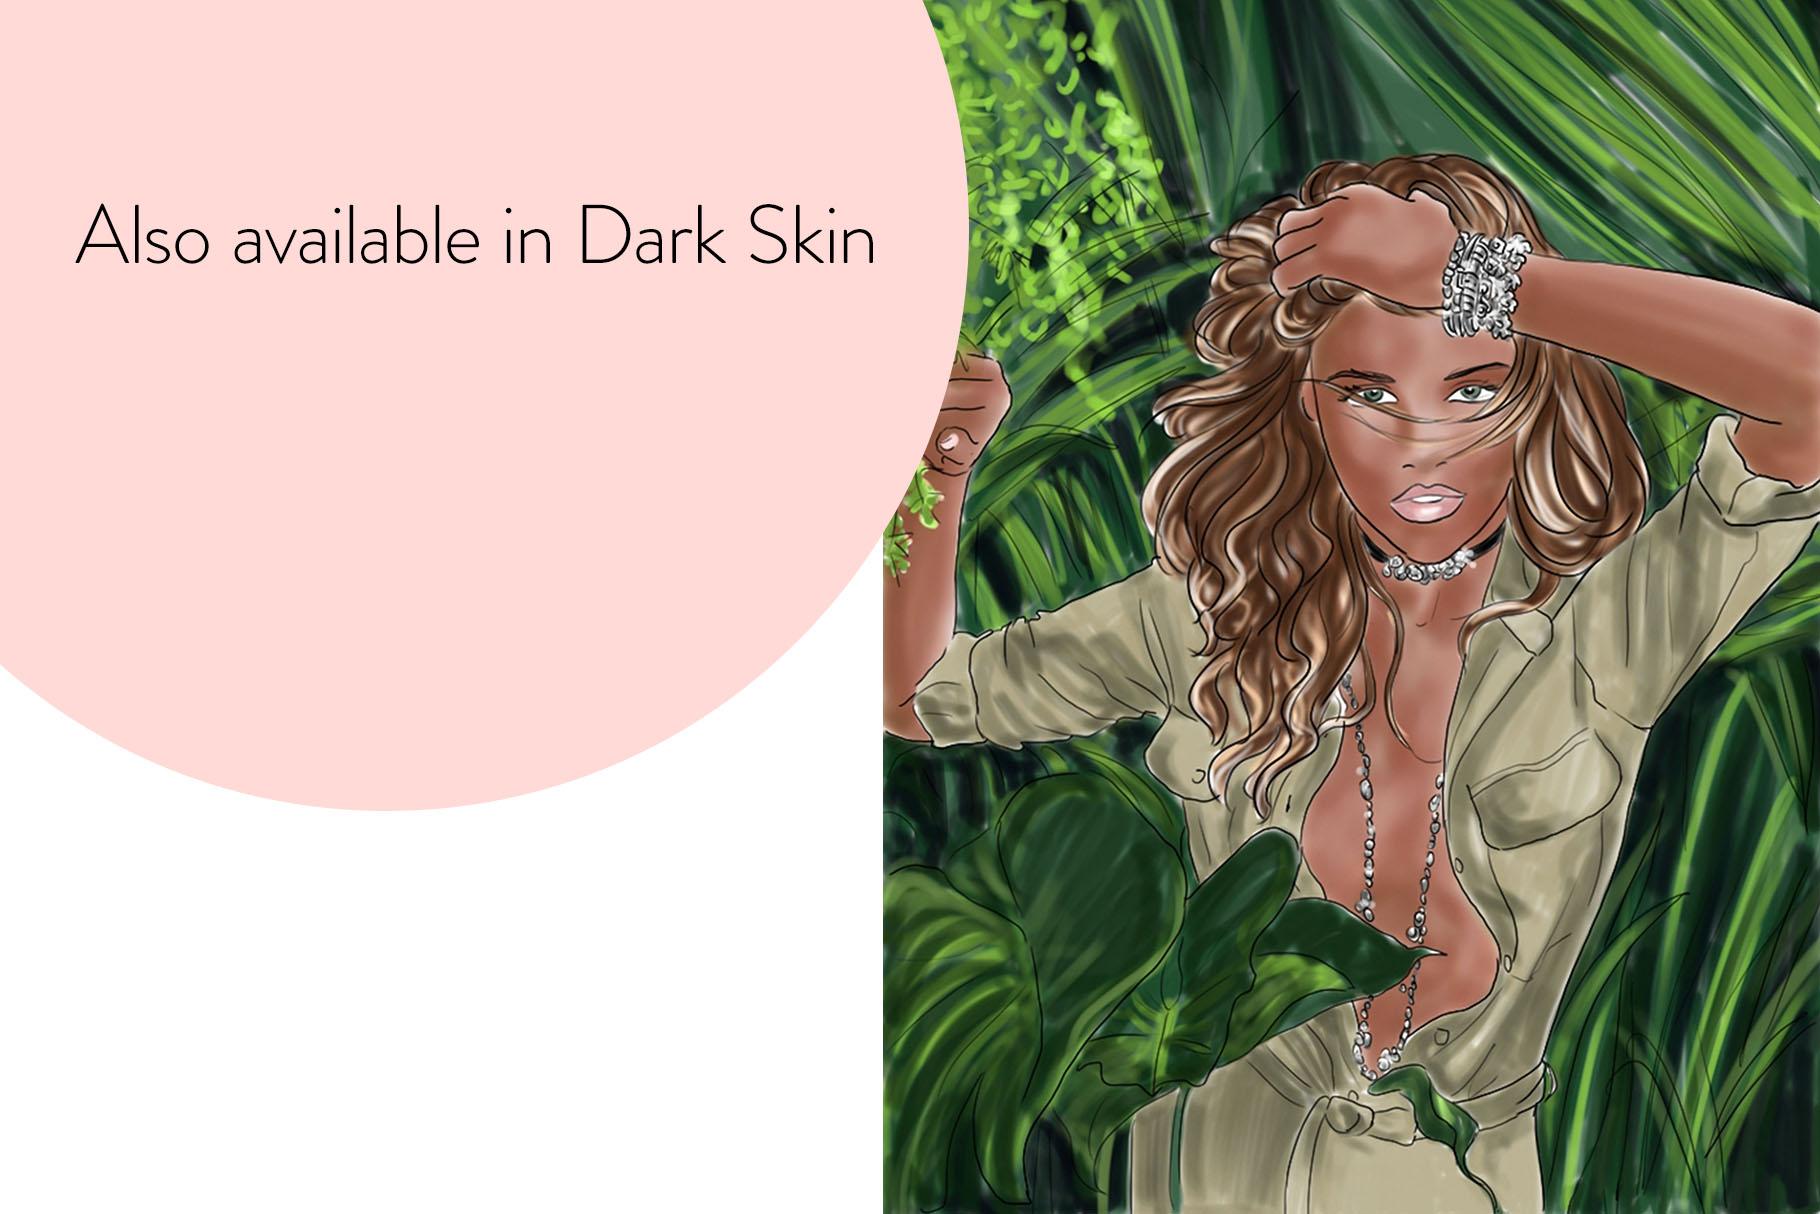 Fashion illustration - Jungle Fever - Light Skin example image 4